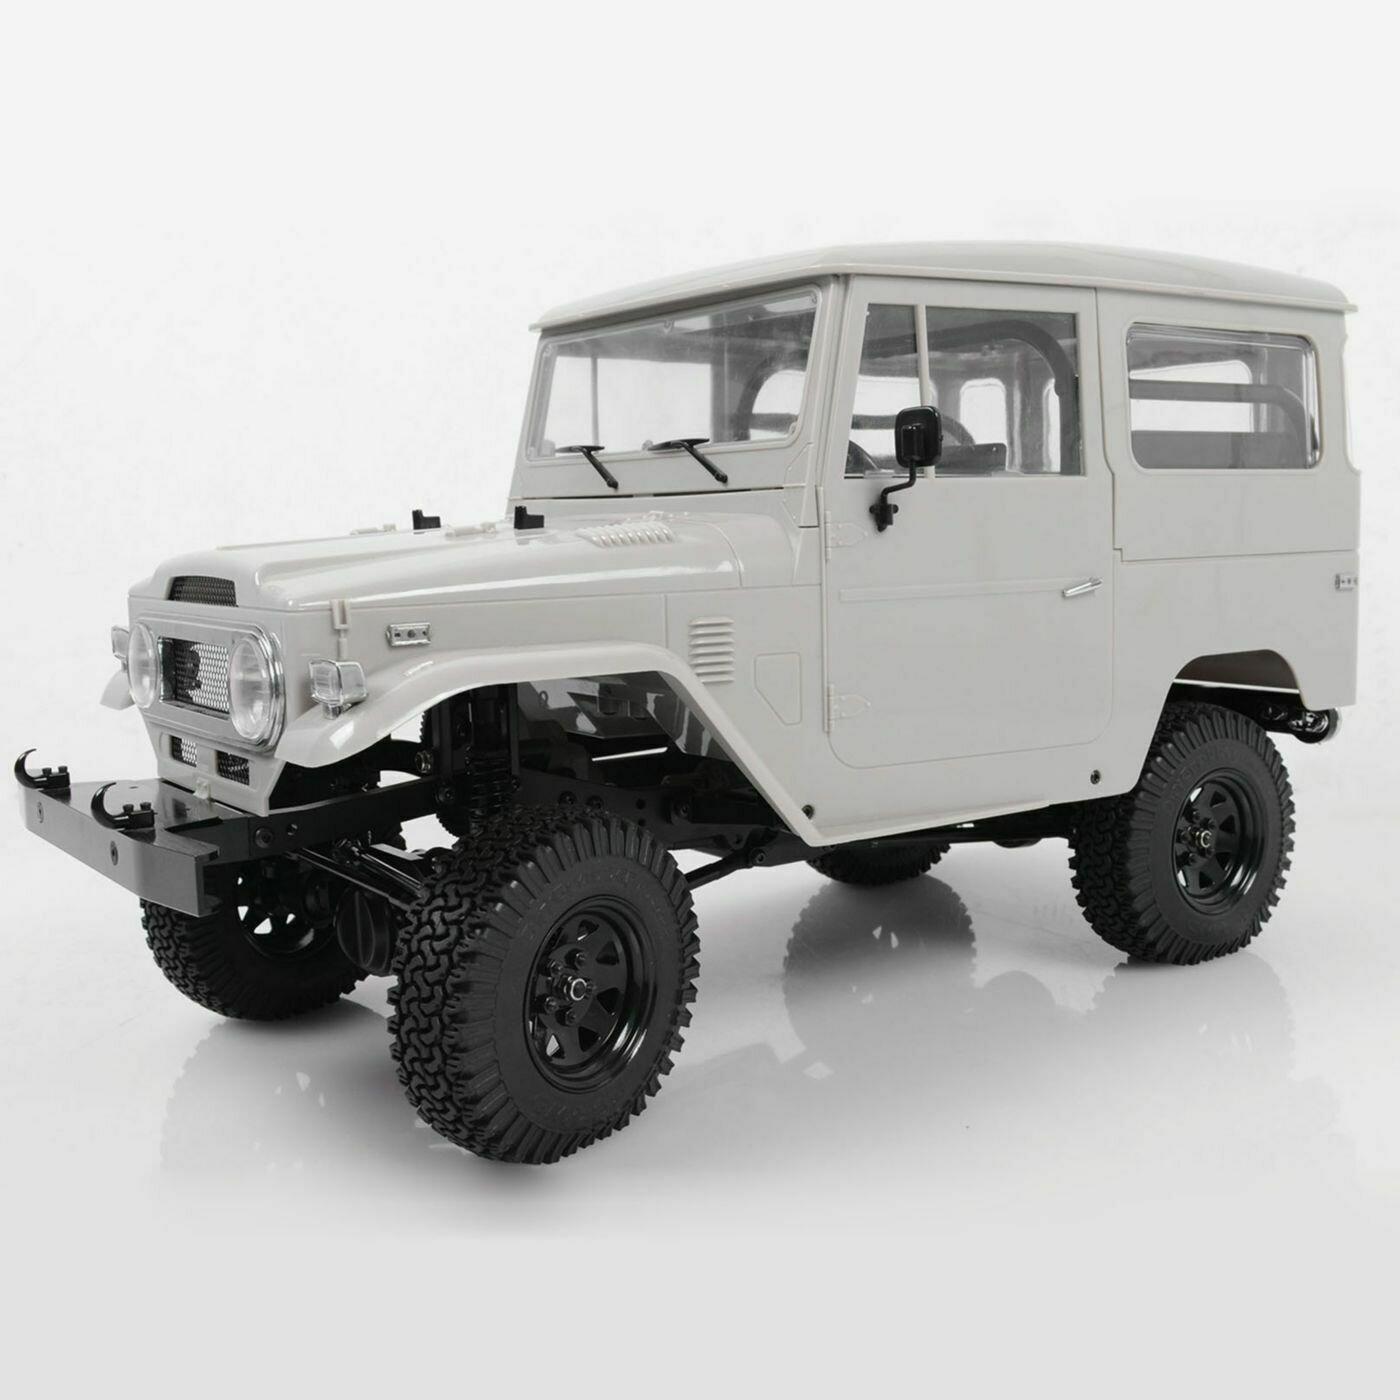 Gelande II Truck Kit with Cruiser Body Set